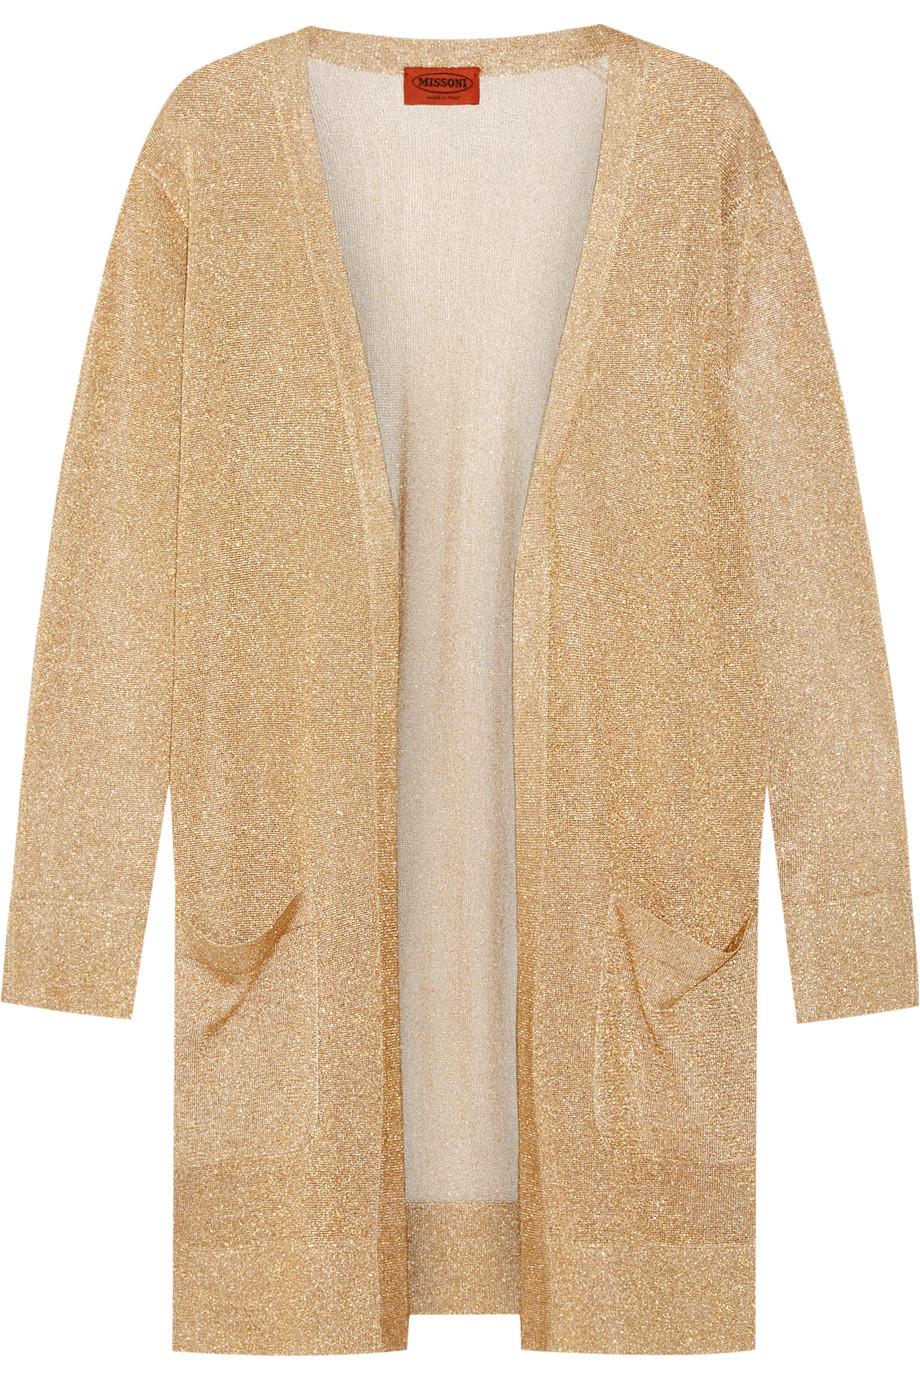 Missoni Metallic Crochet-Knit Cardigan, Gold/Metallic, Women's, Size: 40